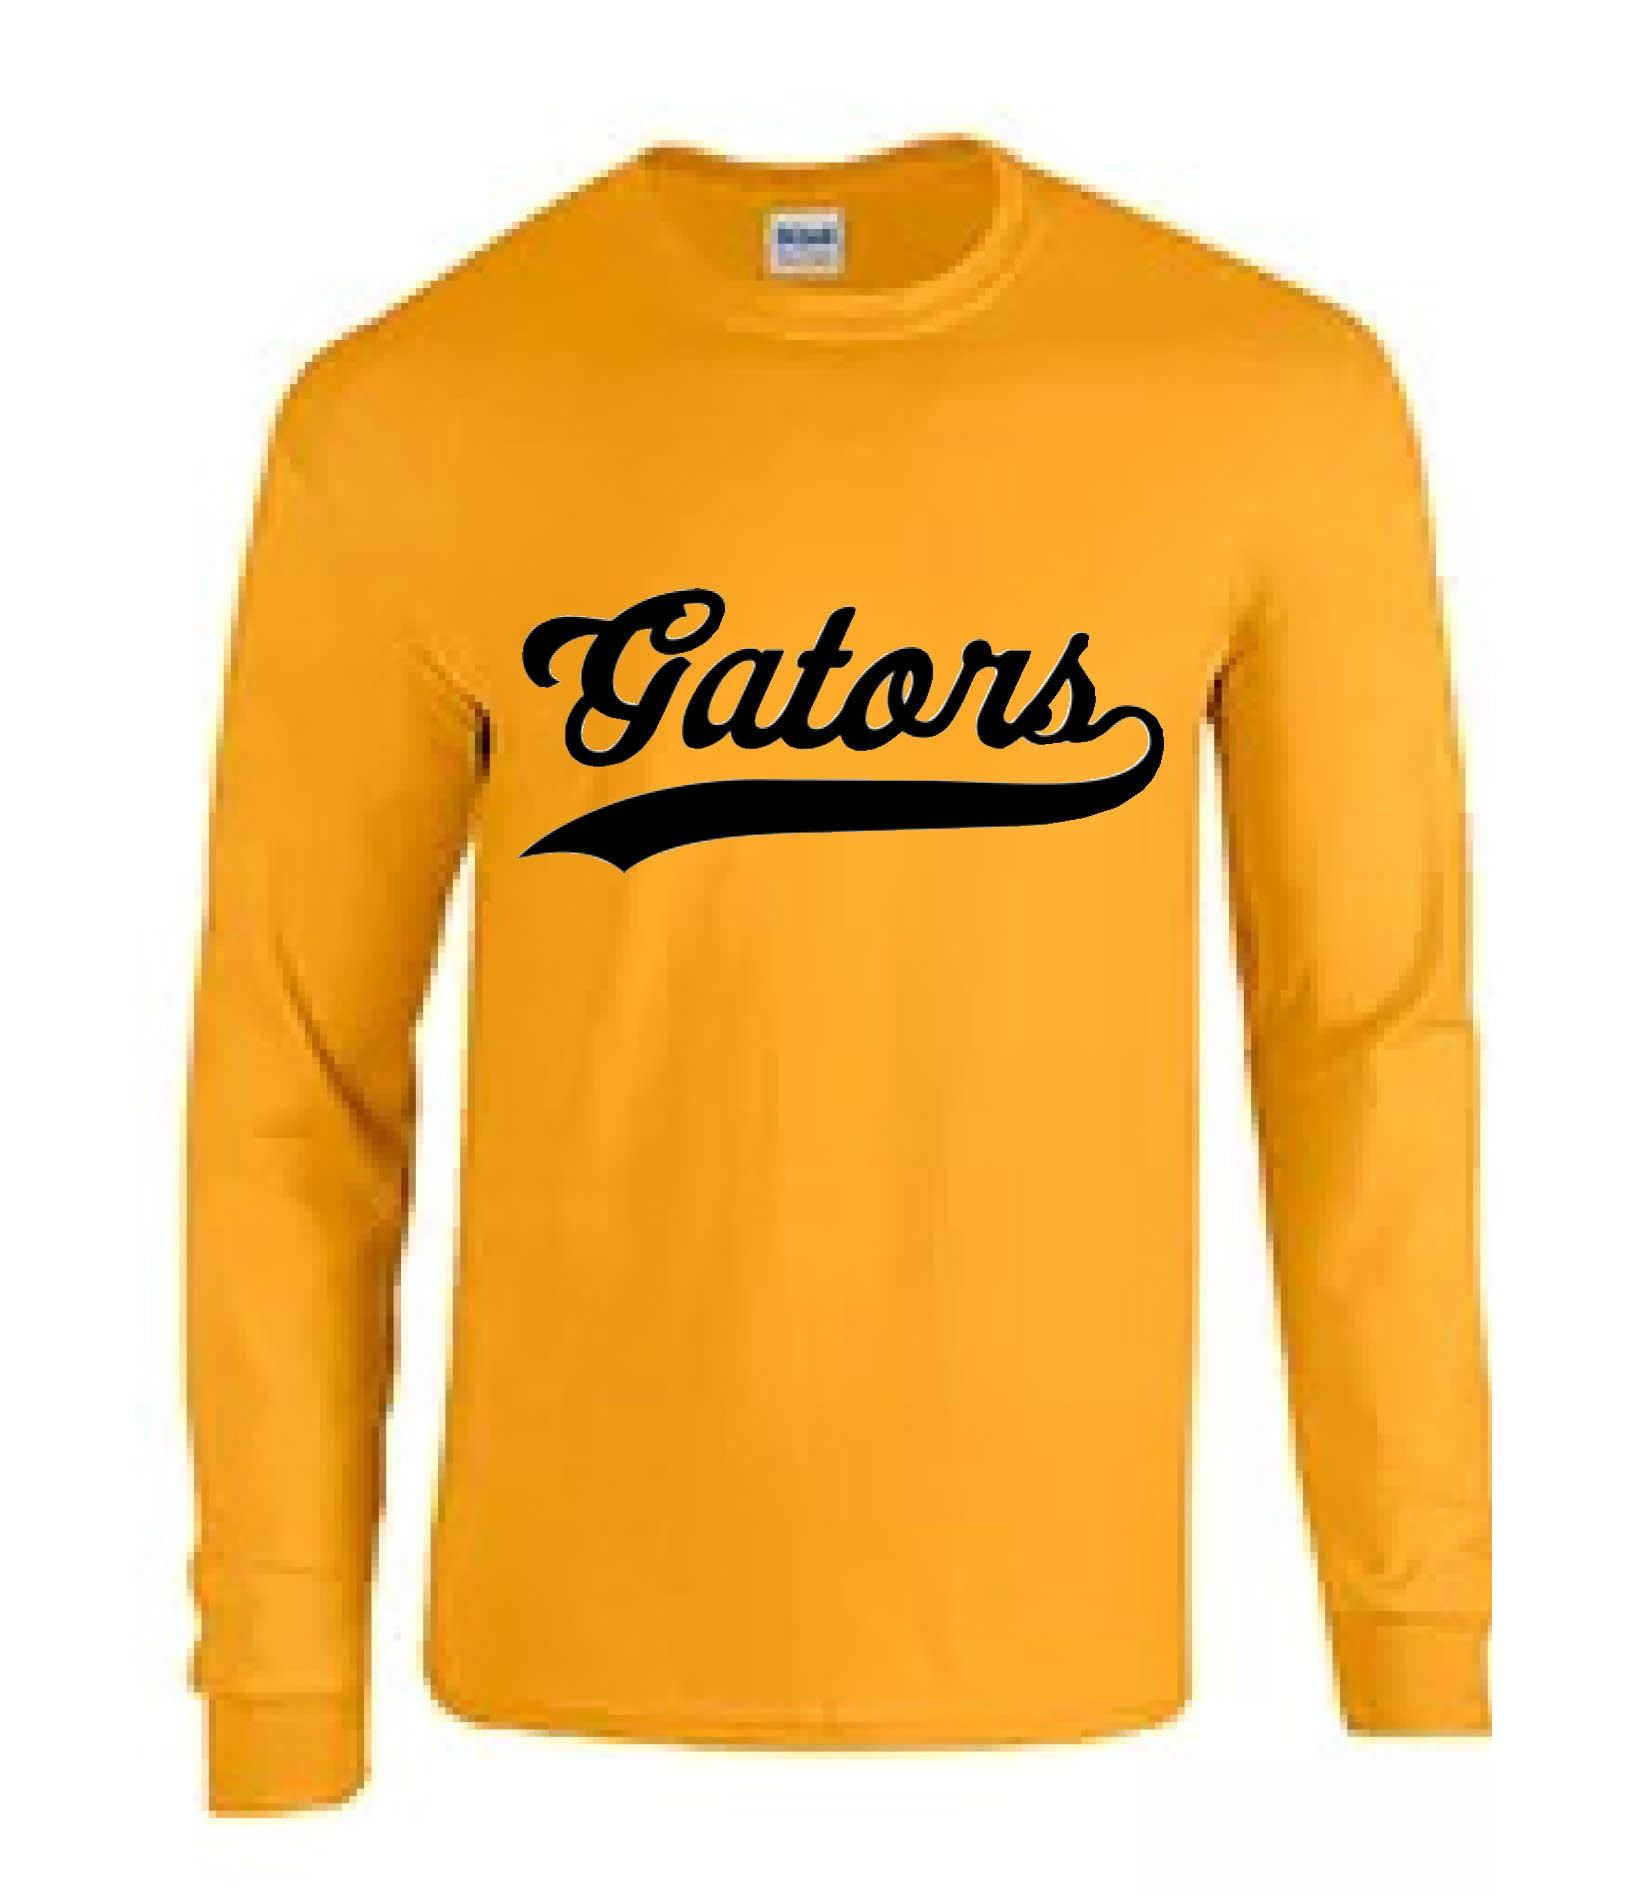 Albany Gators Sweatshirt